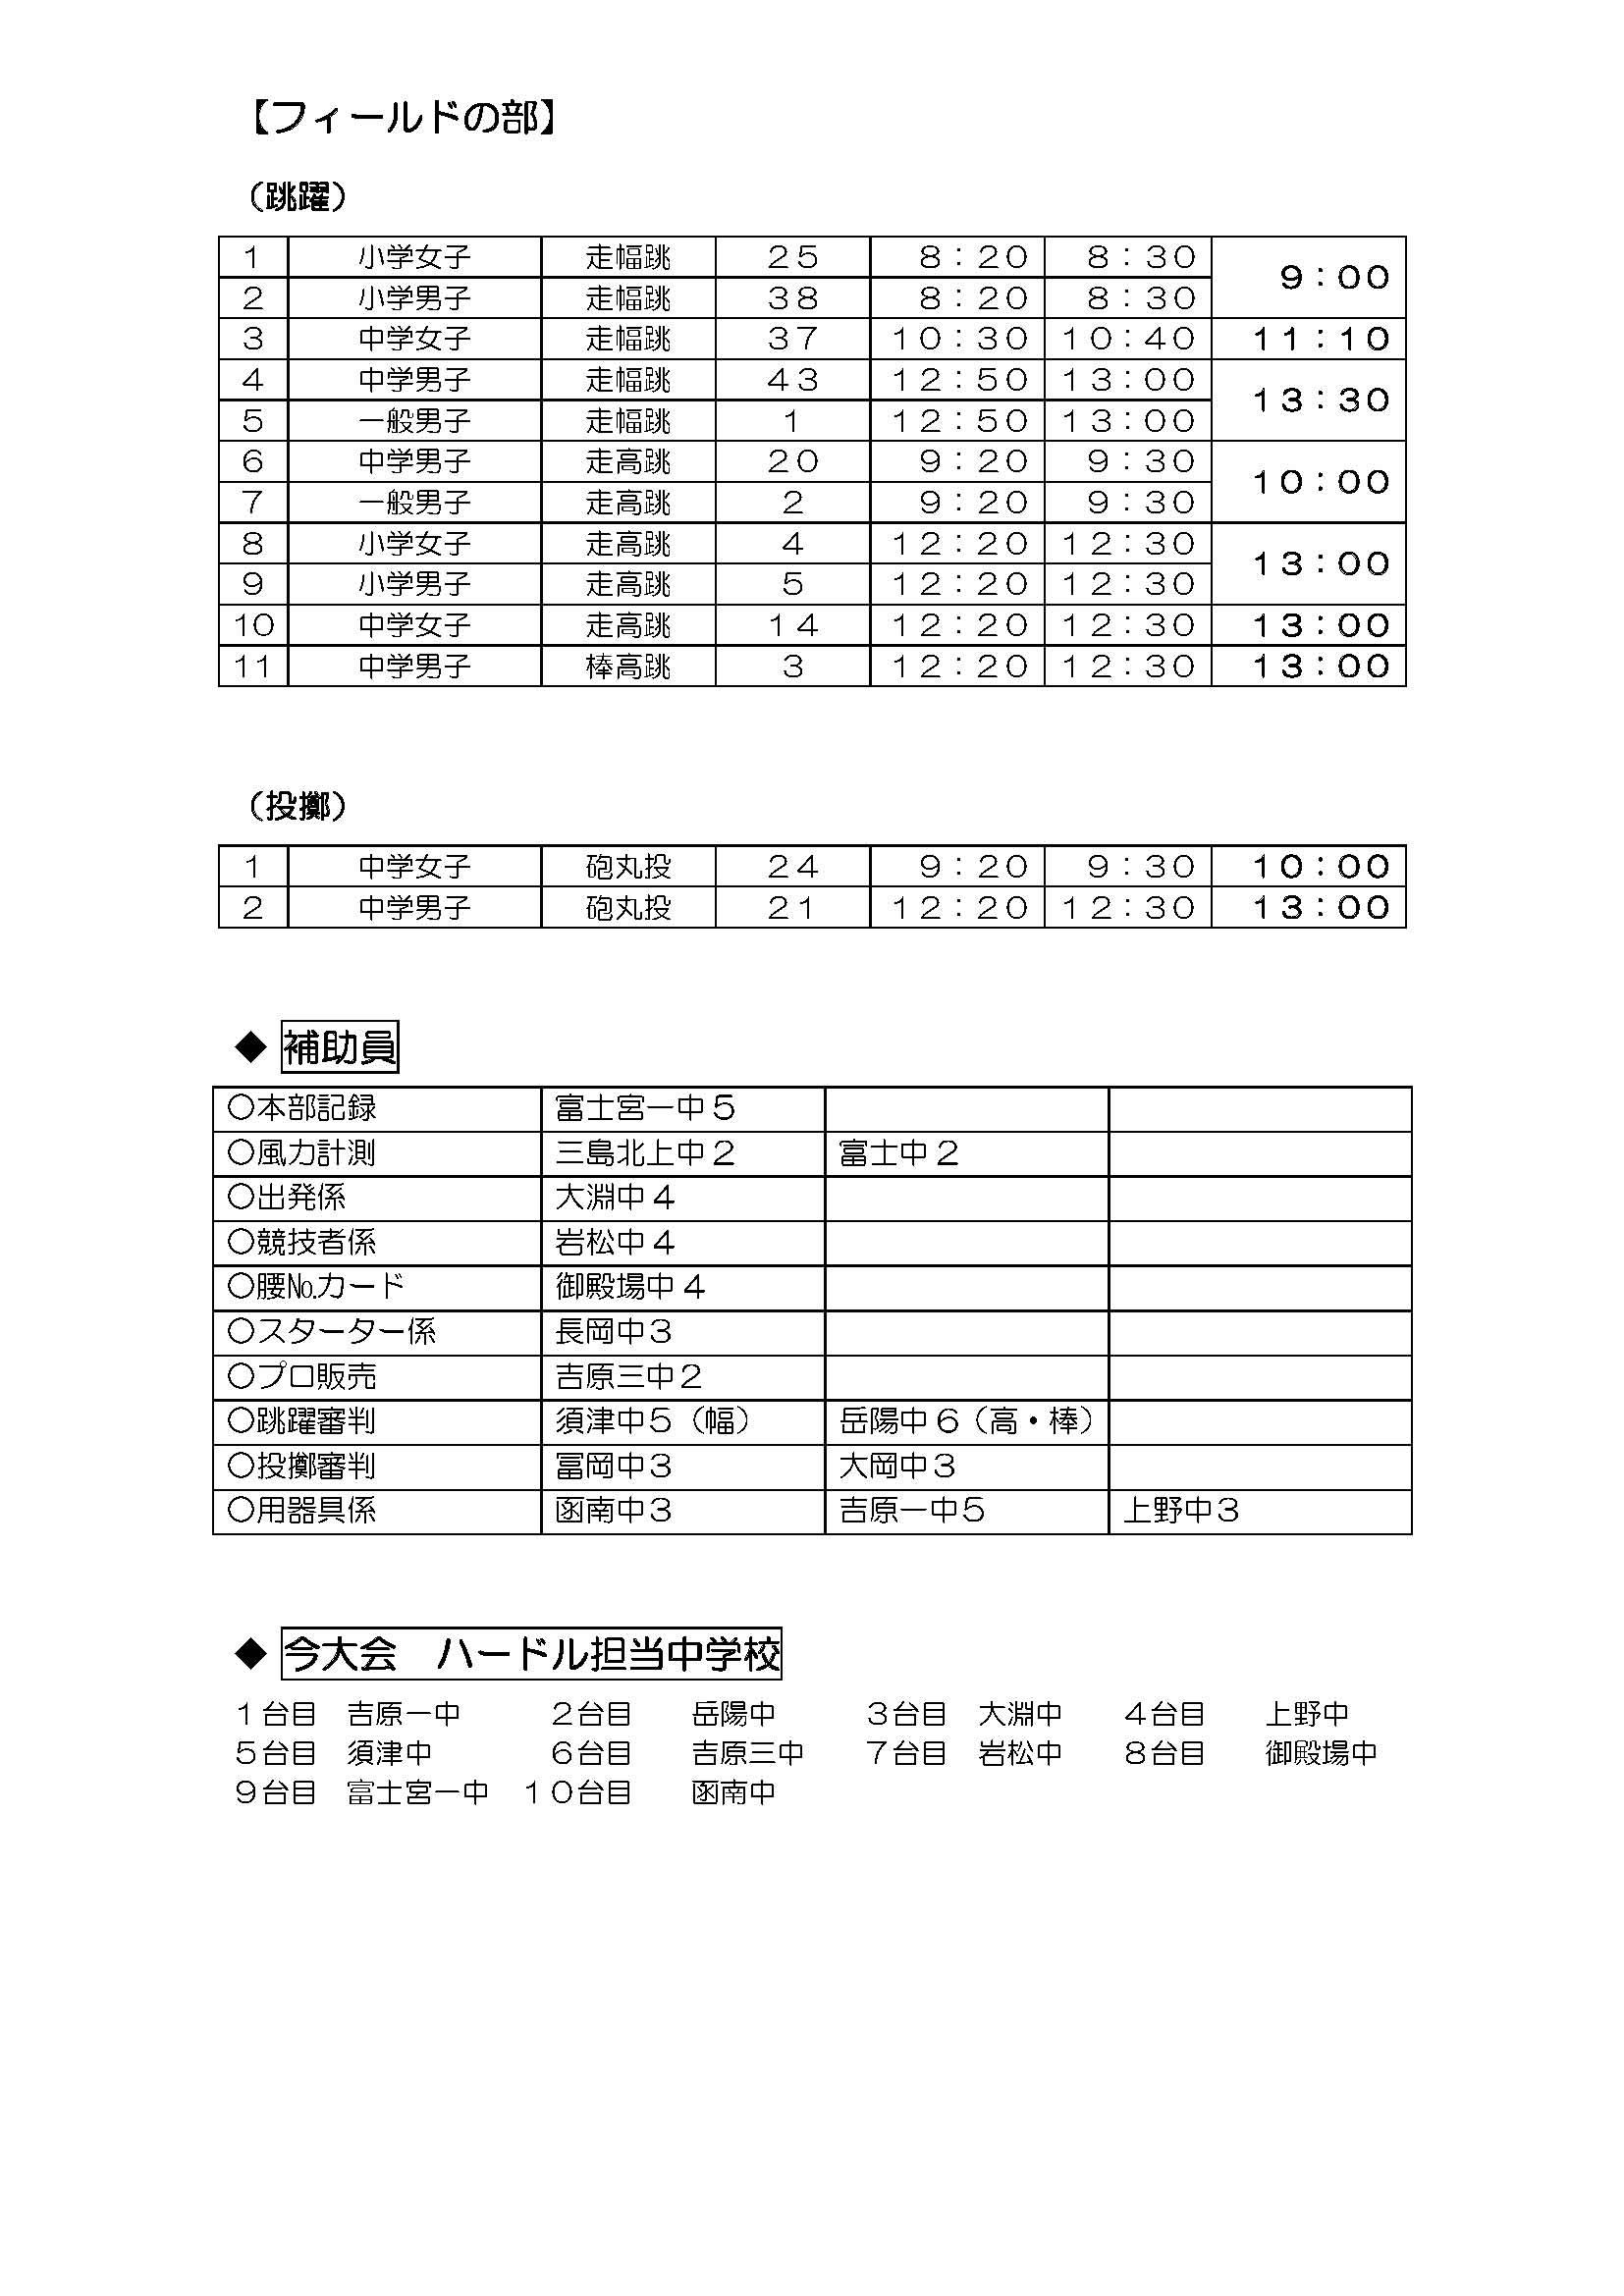 fuji_10_ページ_2